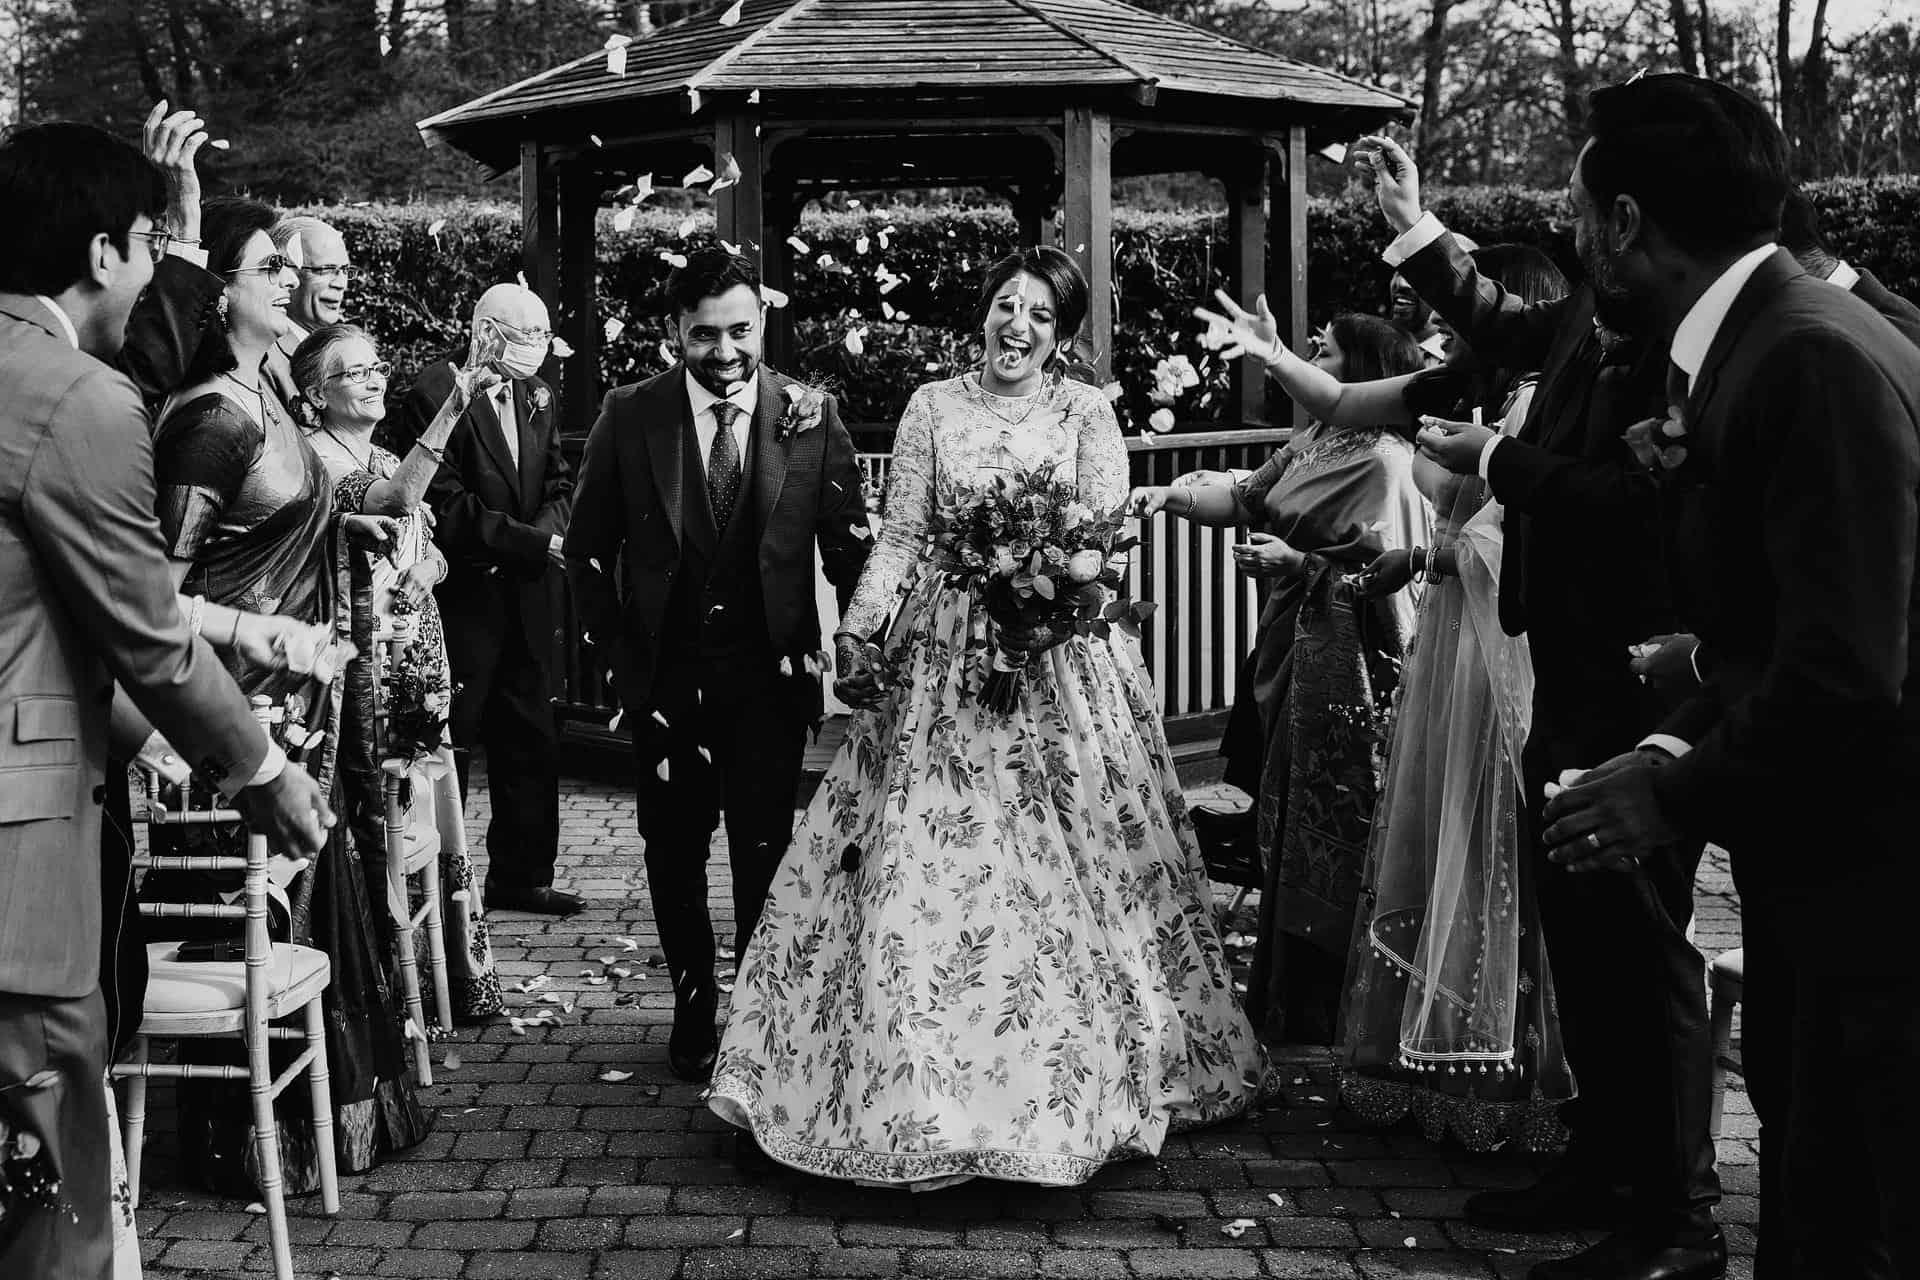 tewin bury farm herftfordshire wedding